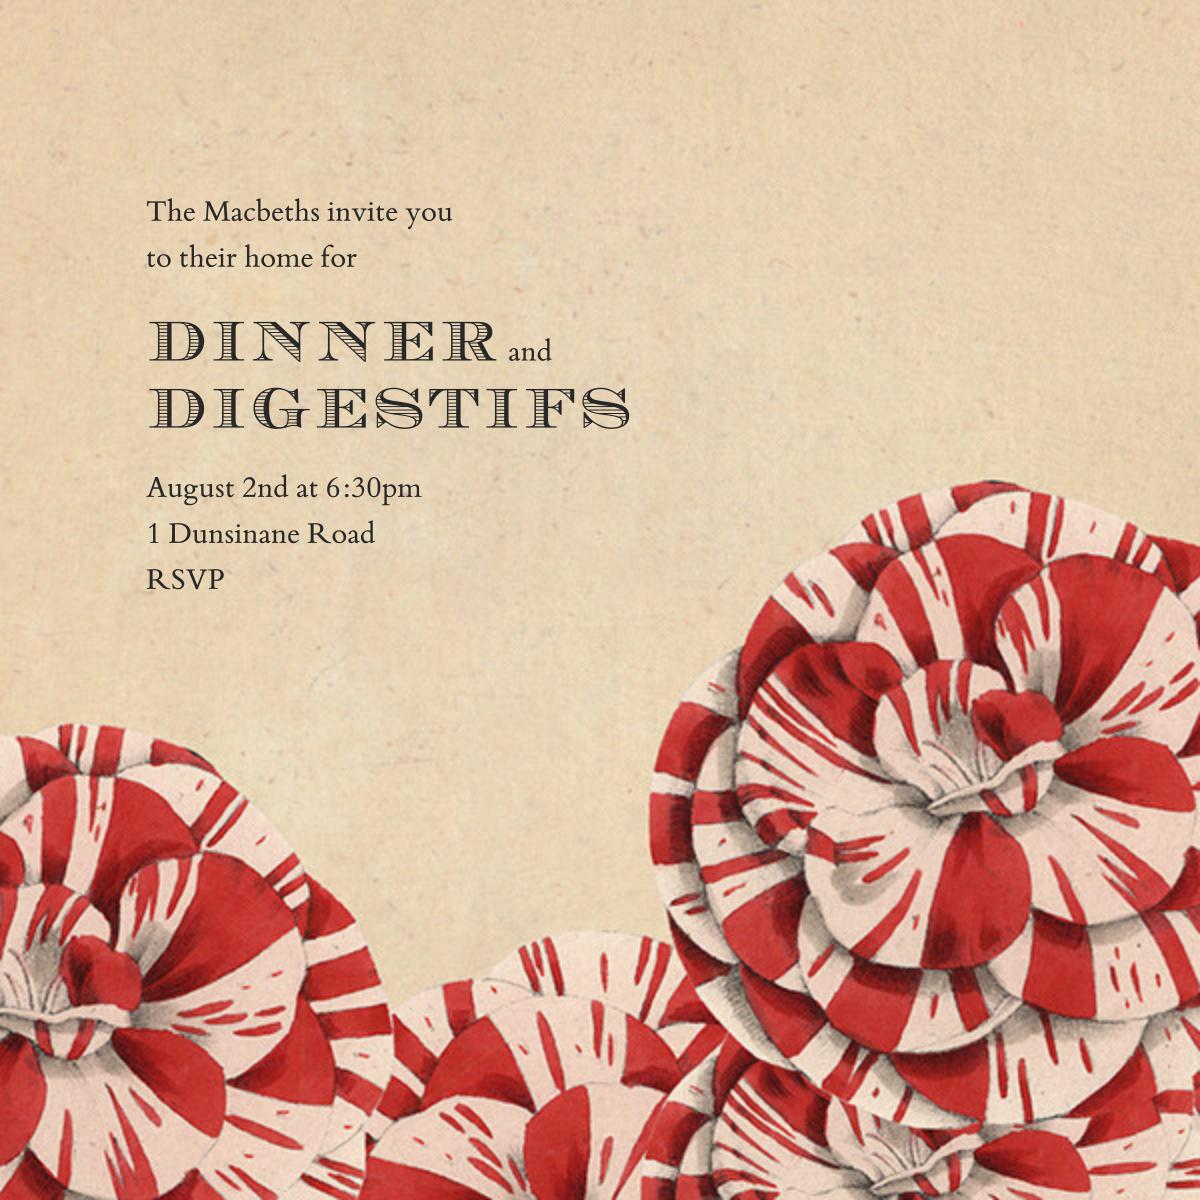 Striped Carnations - John Derian - Dinner party